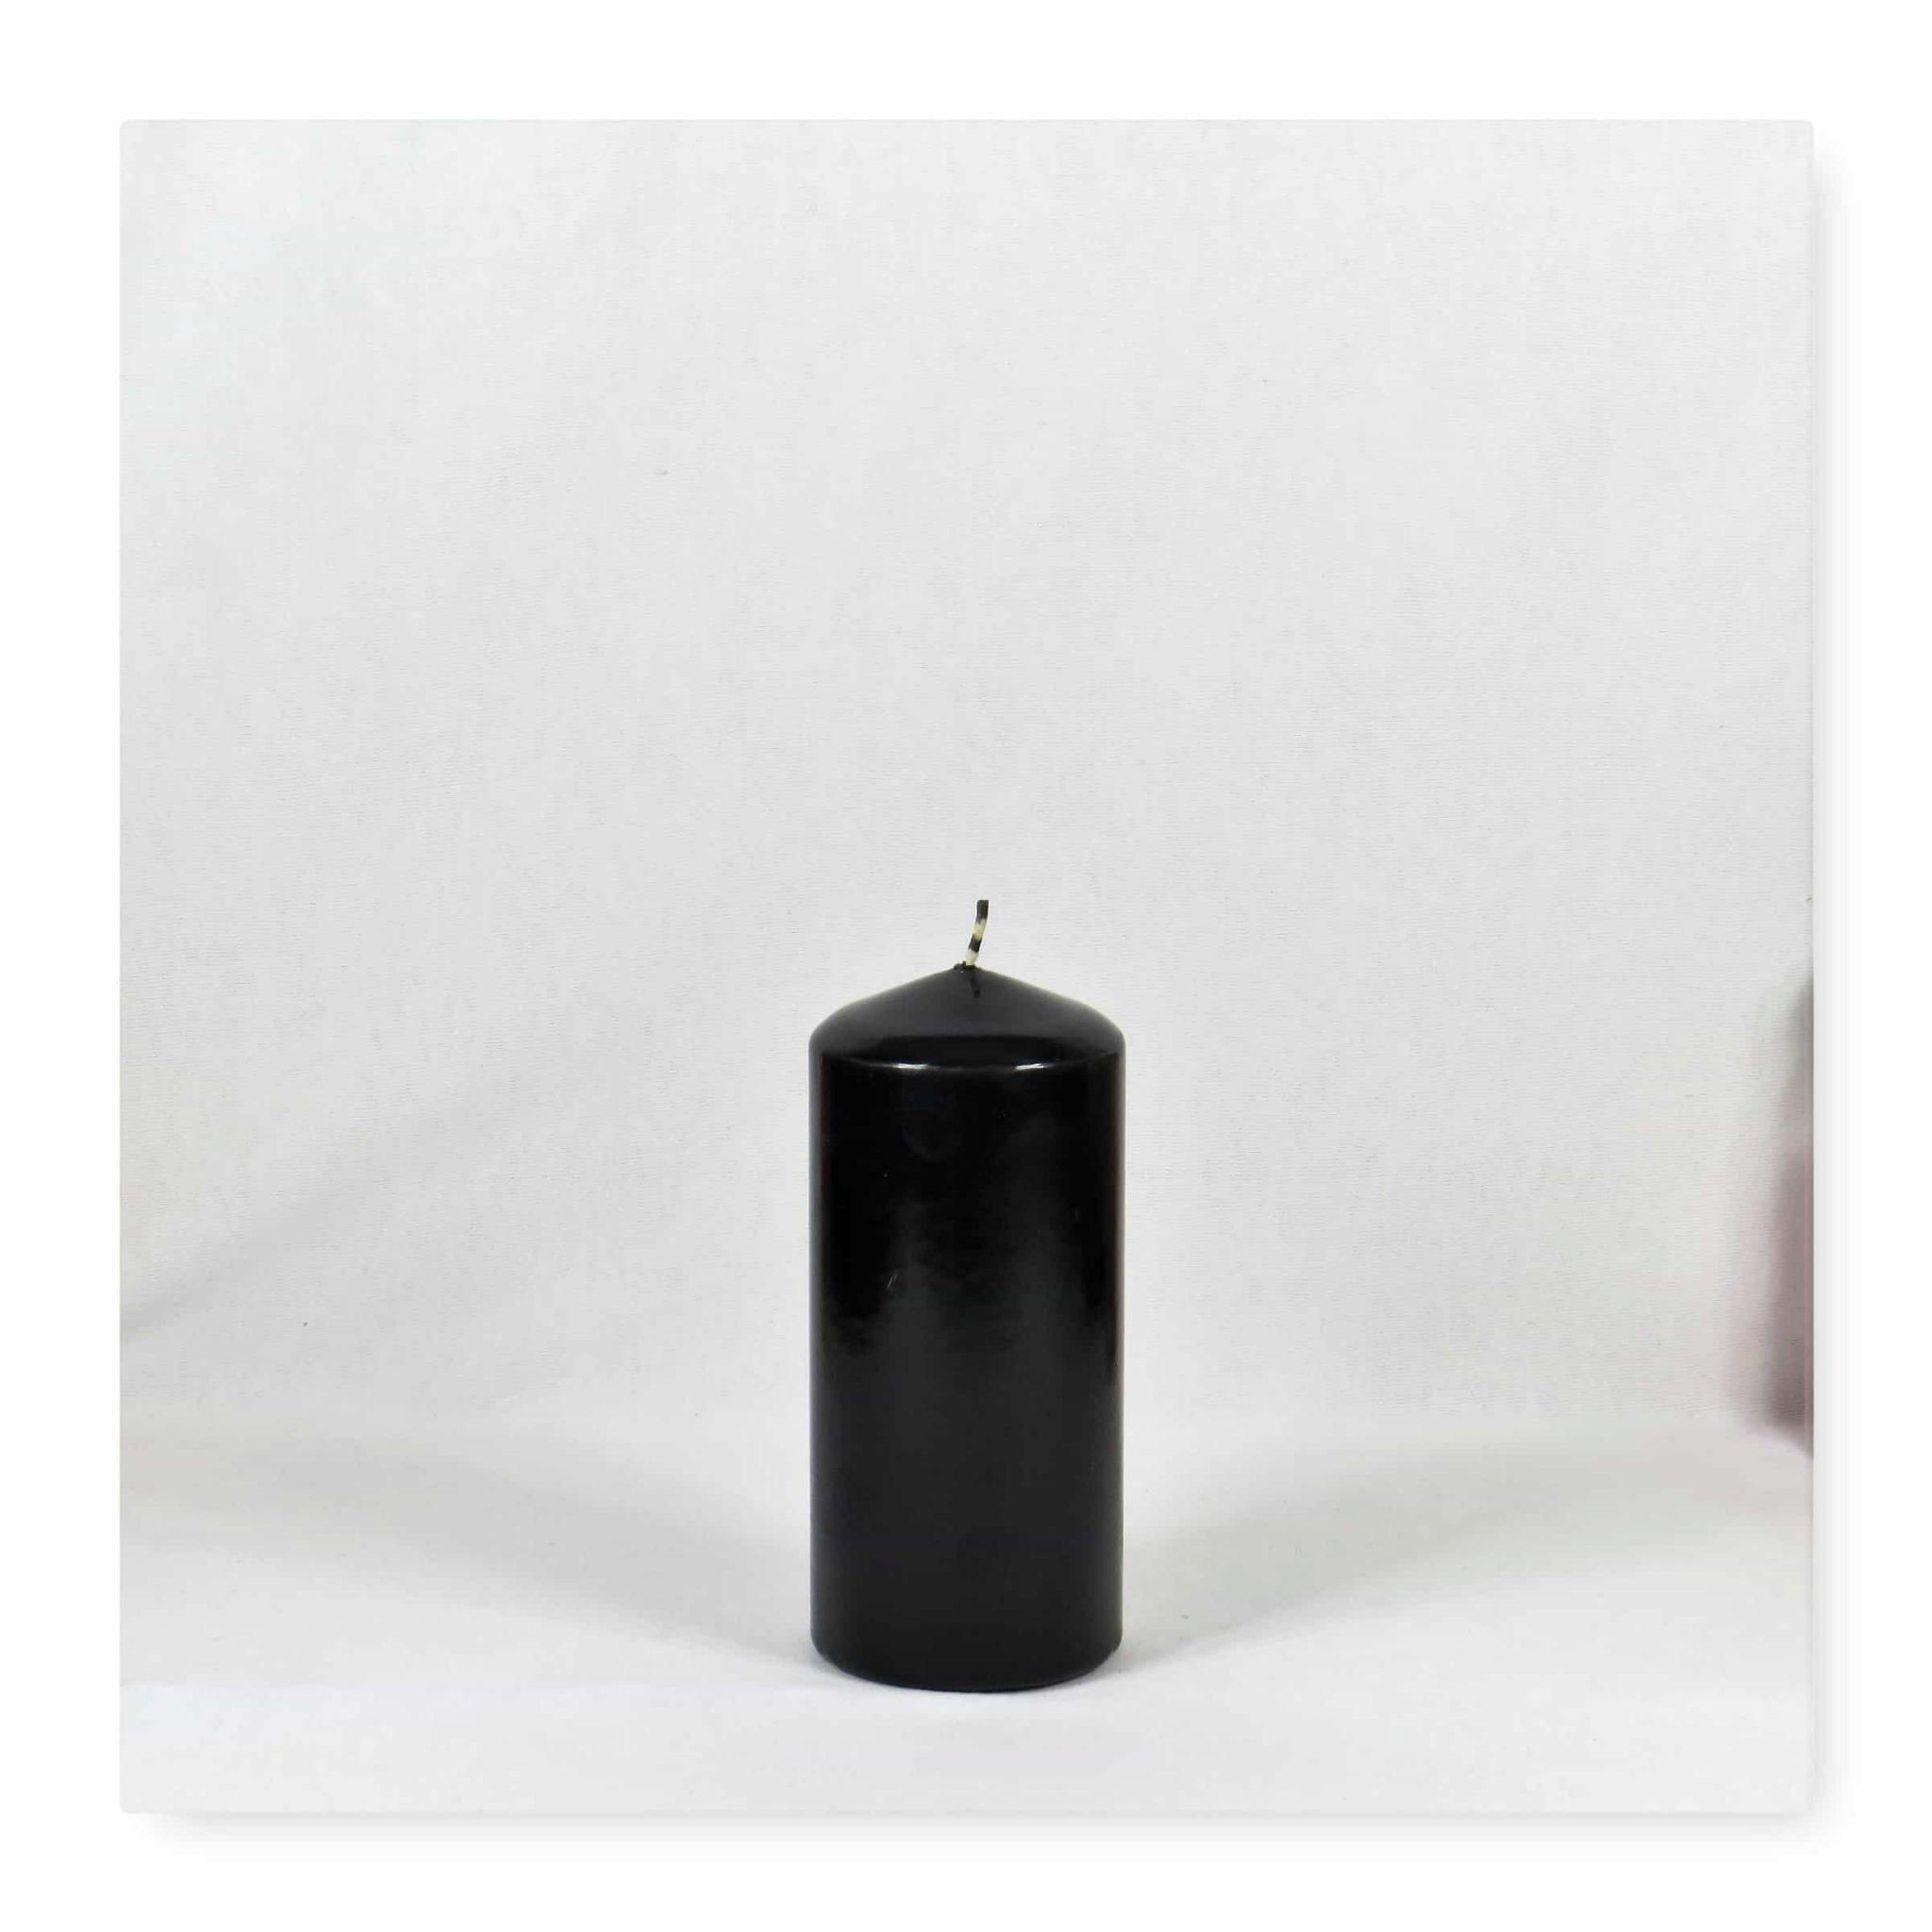 black candles, black pillar candles, black and white candles, black pillar candles bulk, wholesale black candles, black candles bulk